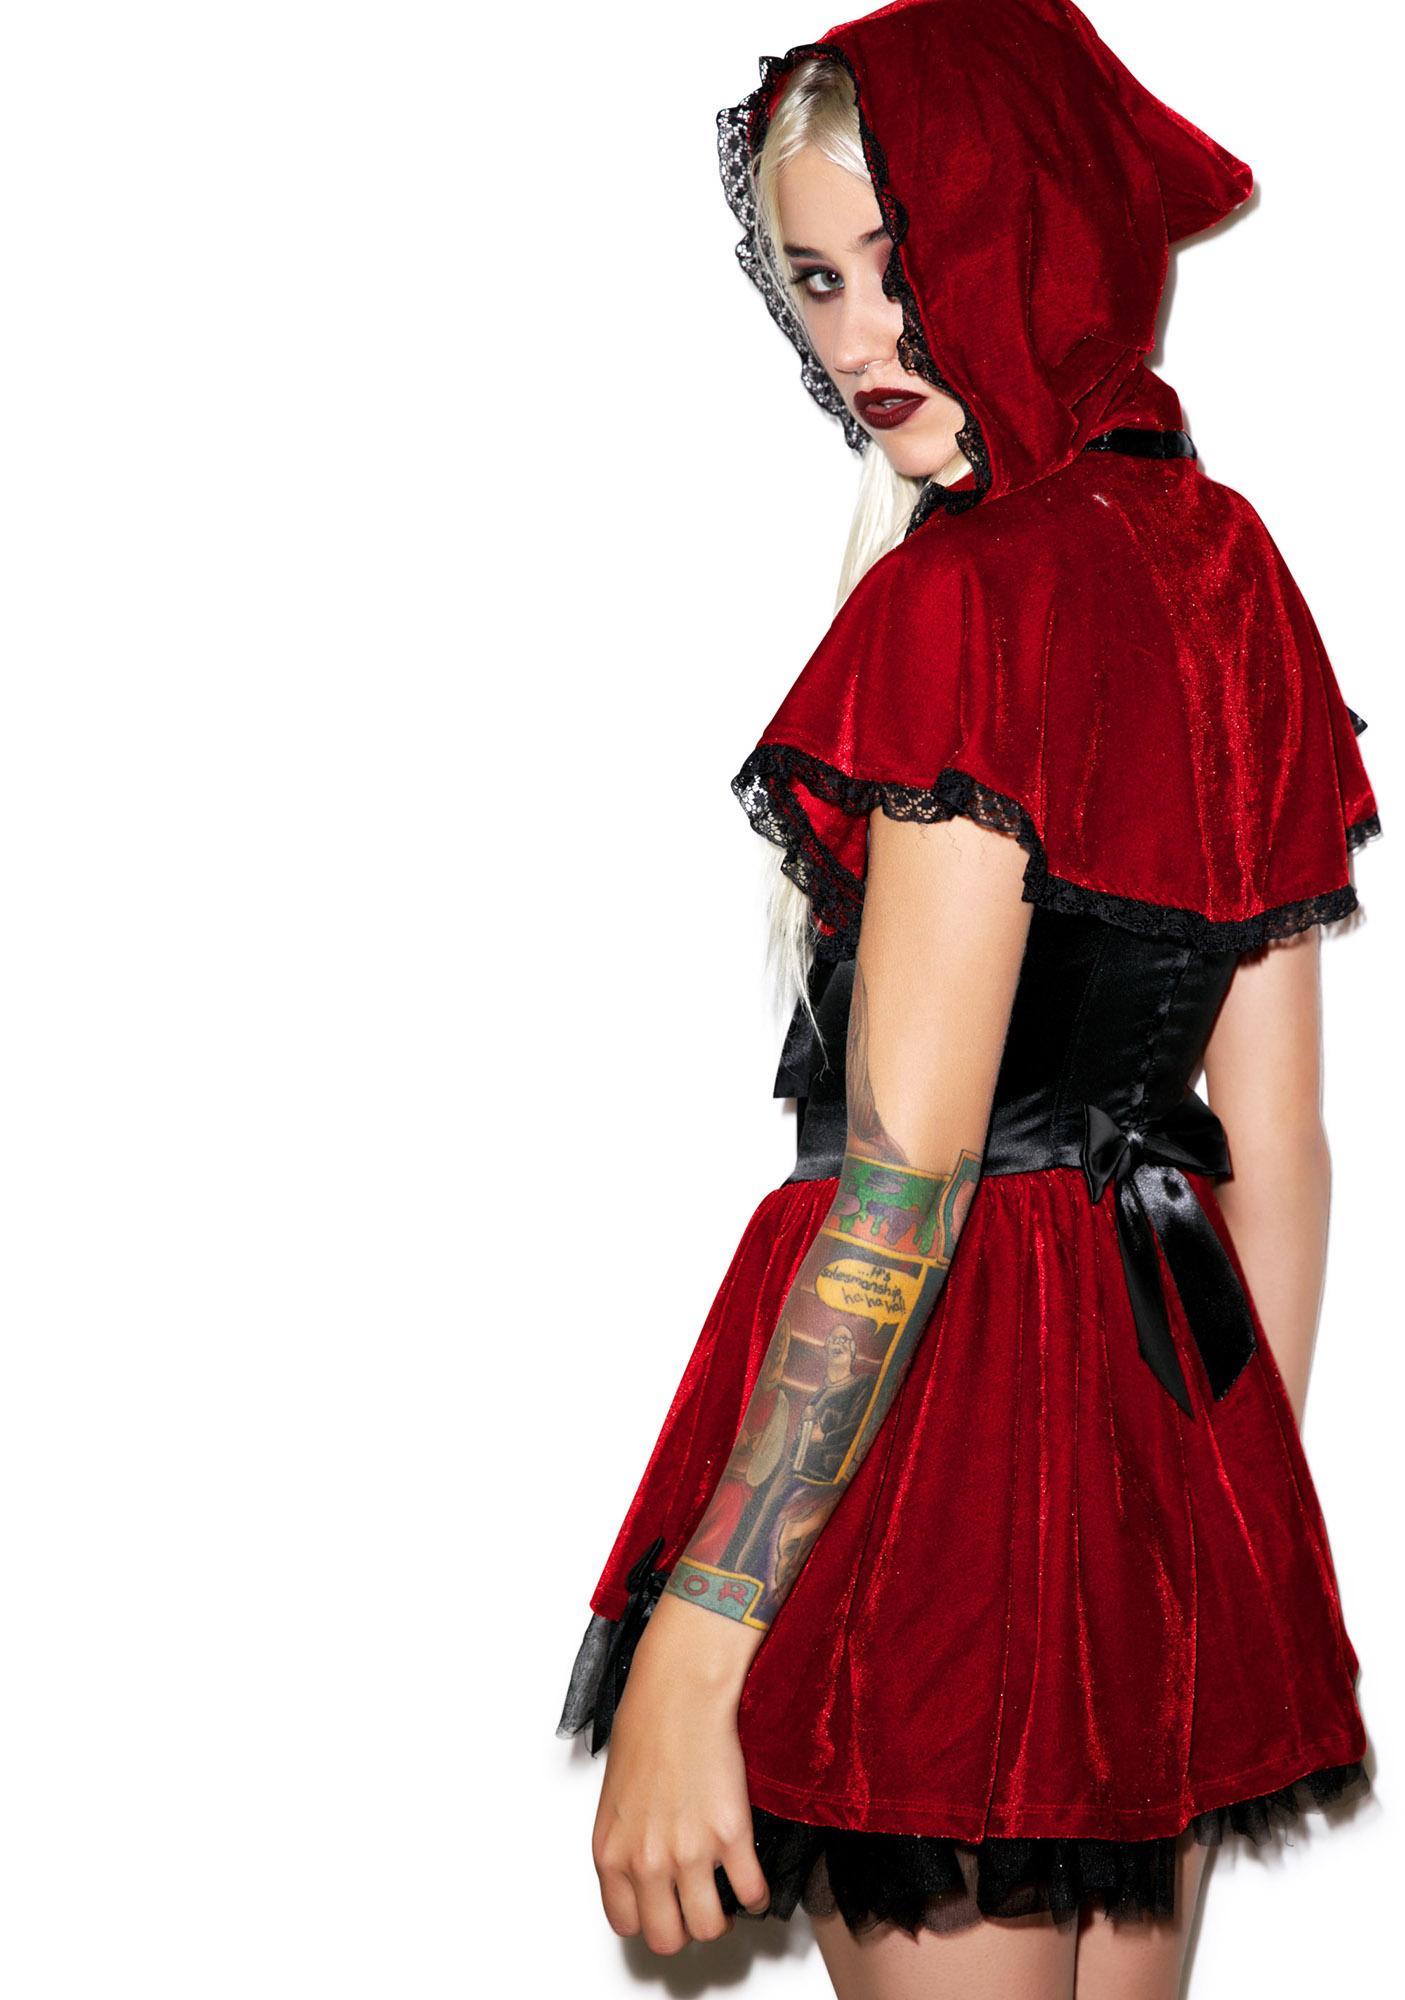 Lip Service Red Ridin' Yer Hood Costume